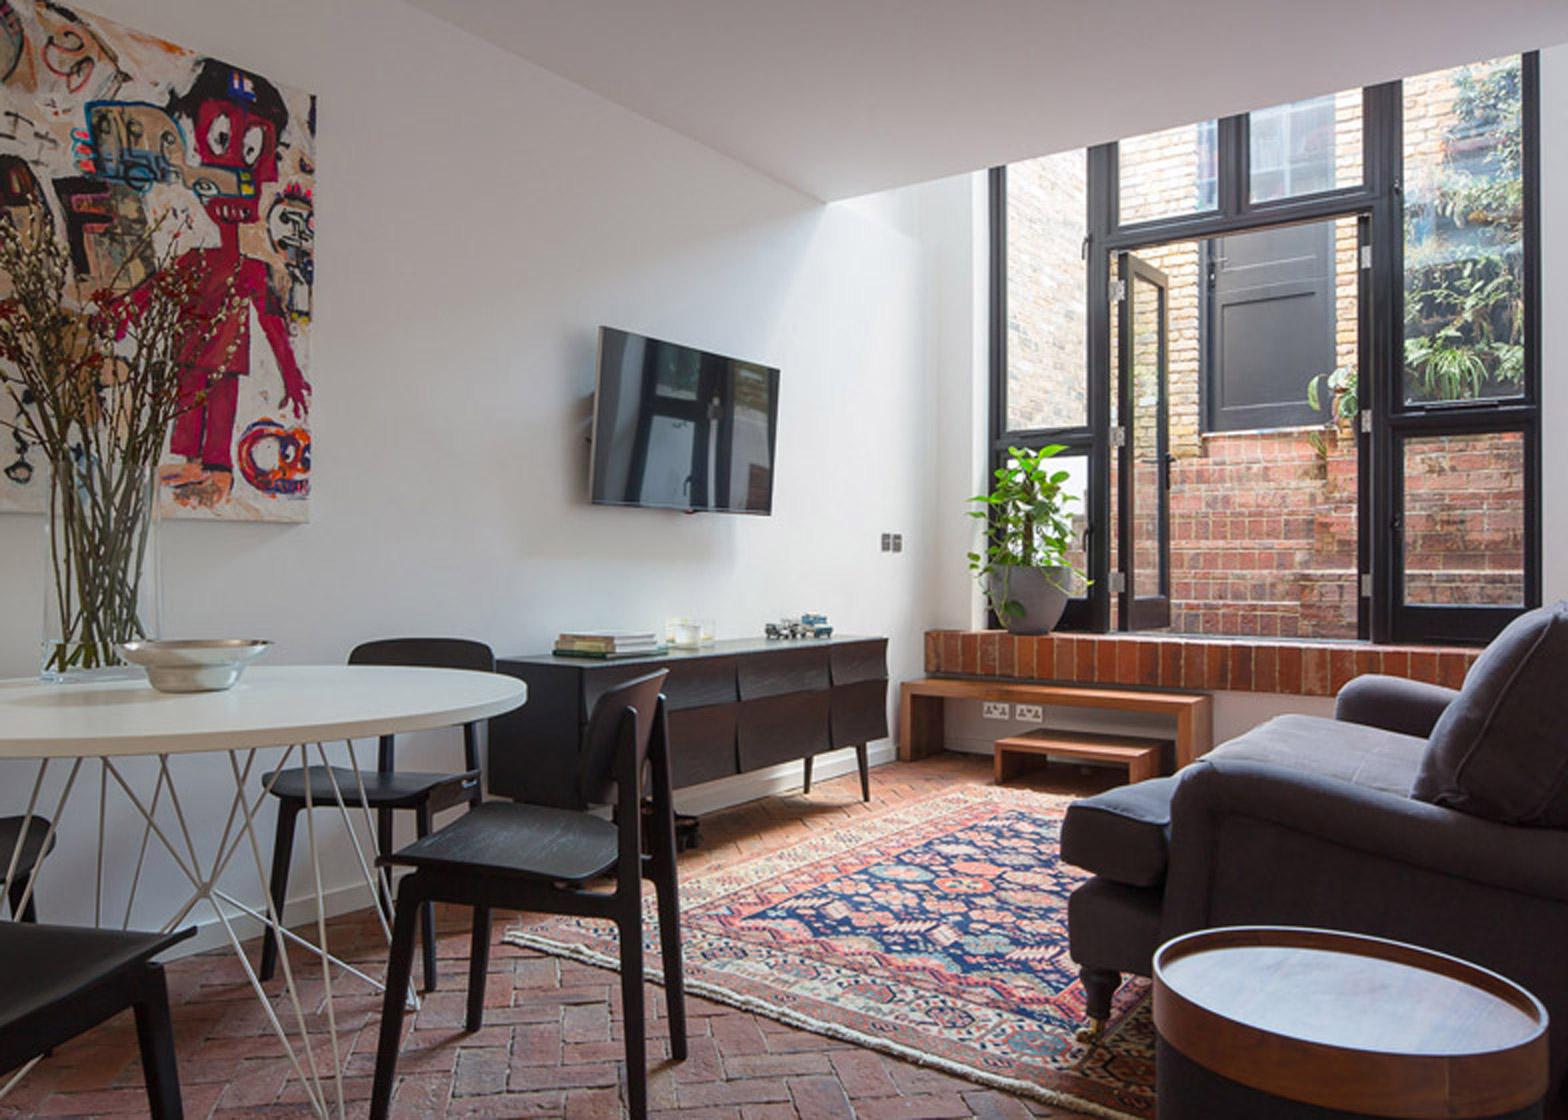 Old upholsterer's workshop in London on the top 10 brick interiors on Dezeen's Pinterest boards